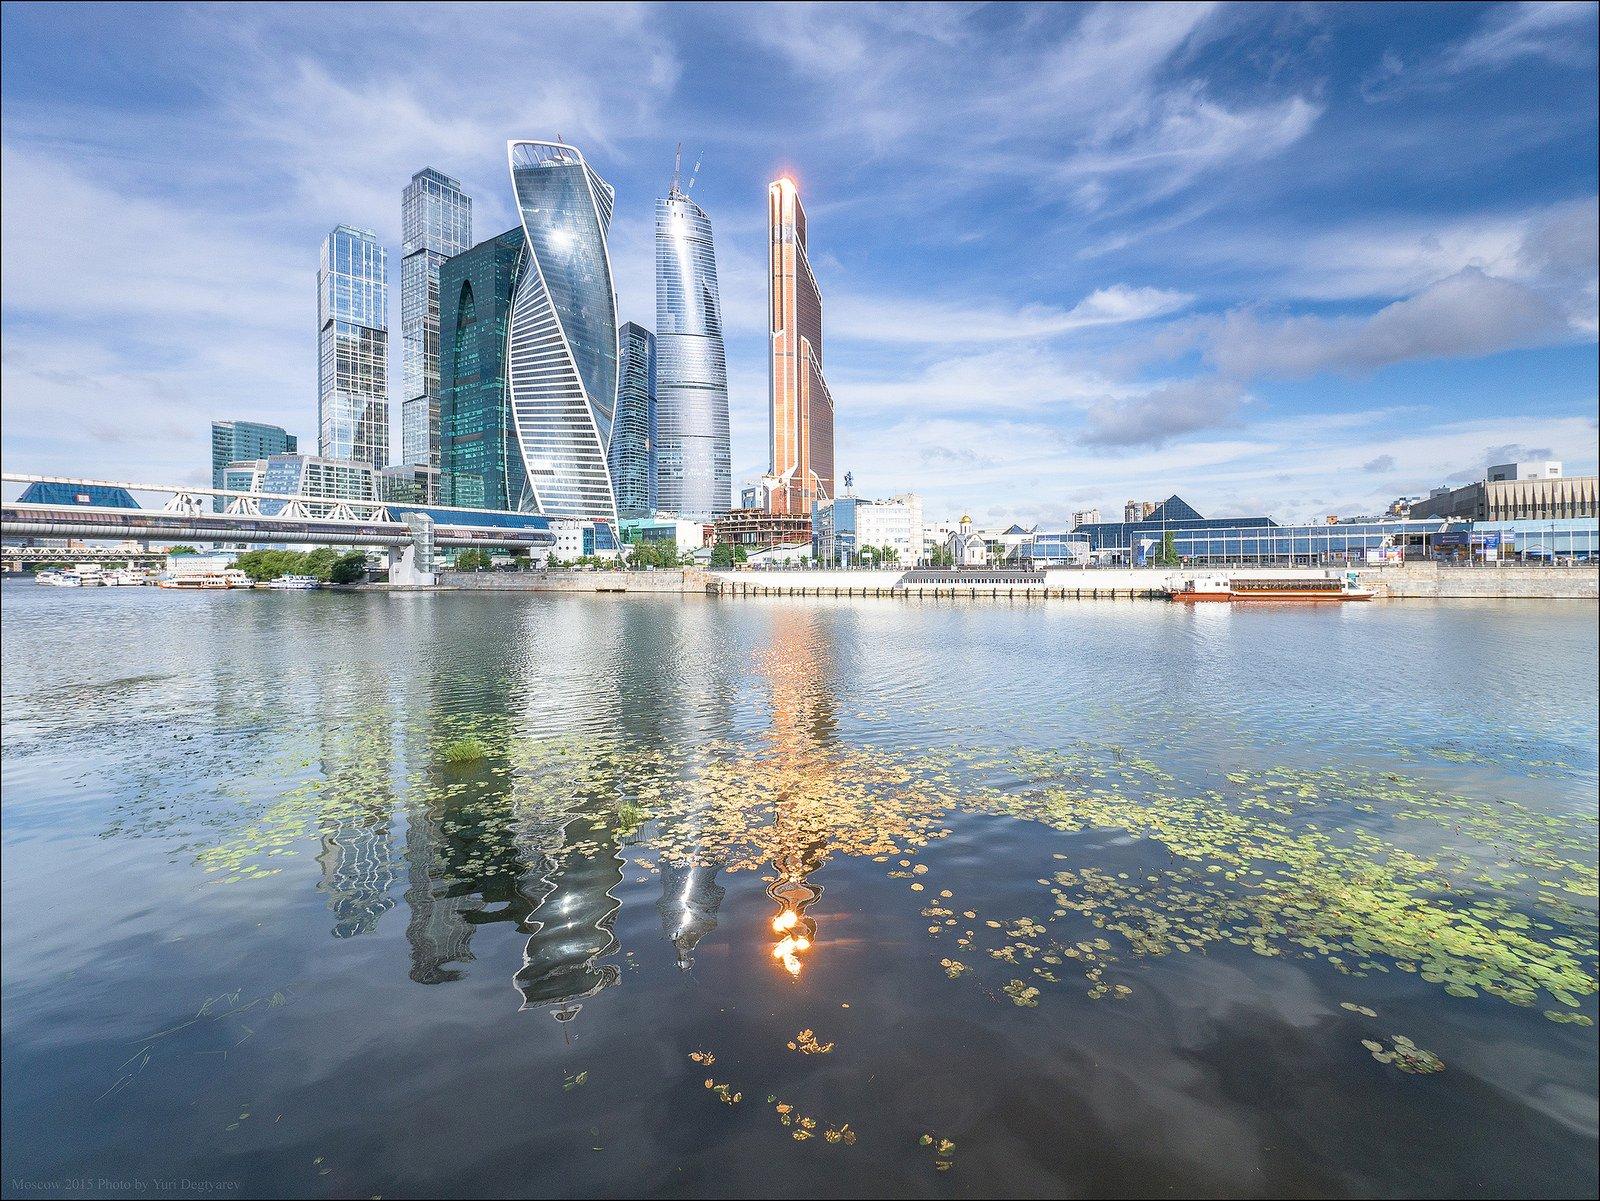 Москва, Небоскрёбы, Облака, Река, Россия, Сити, Юрий Дегтярёв